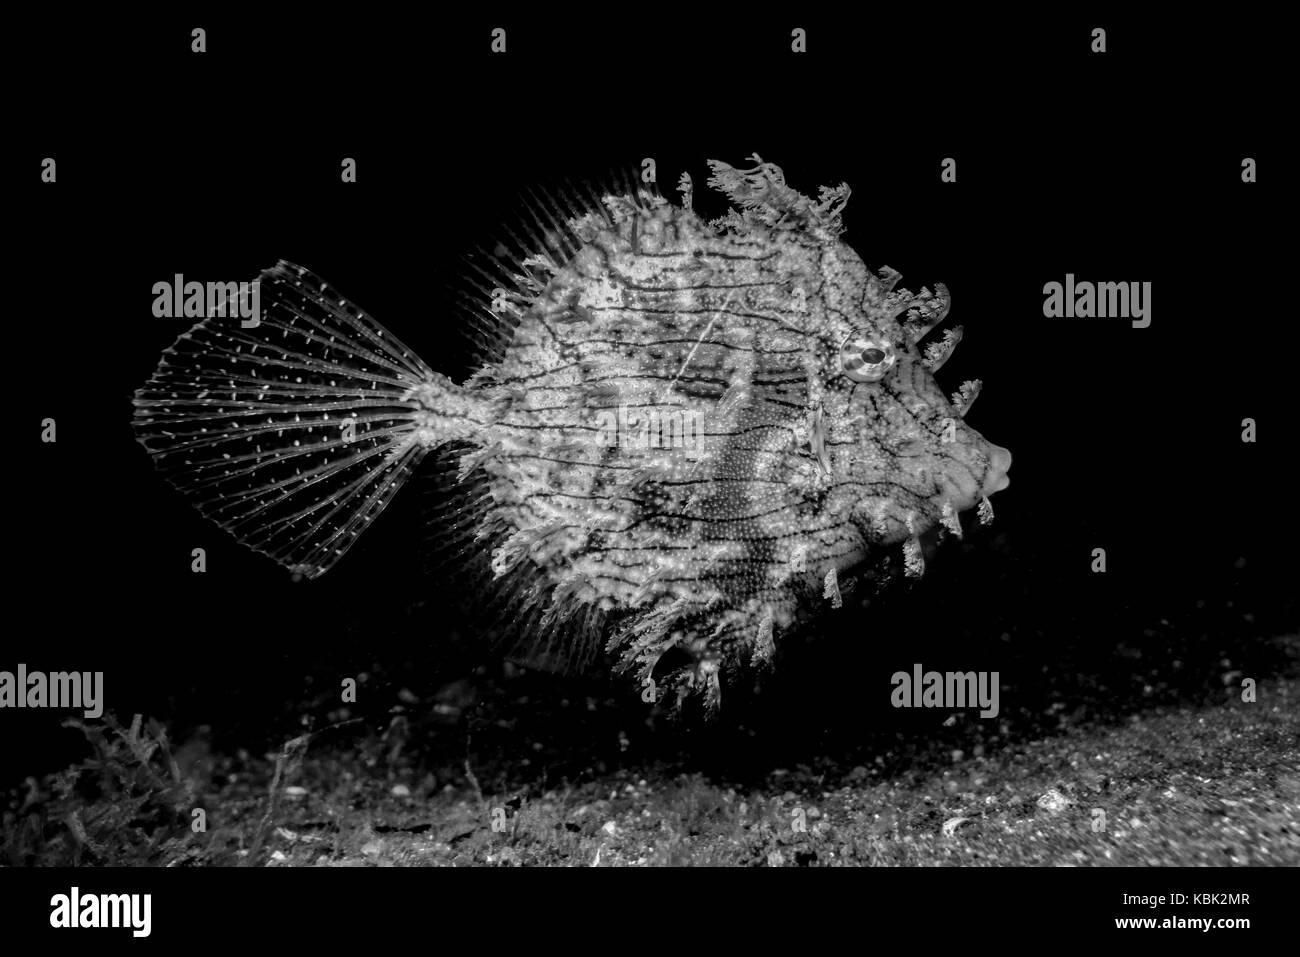 Leafy Filefish (Chaetodermis penicilligera) in the Lembeh Strait / Sulawesi / Indonesia - Stock Image